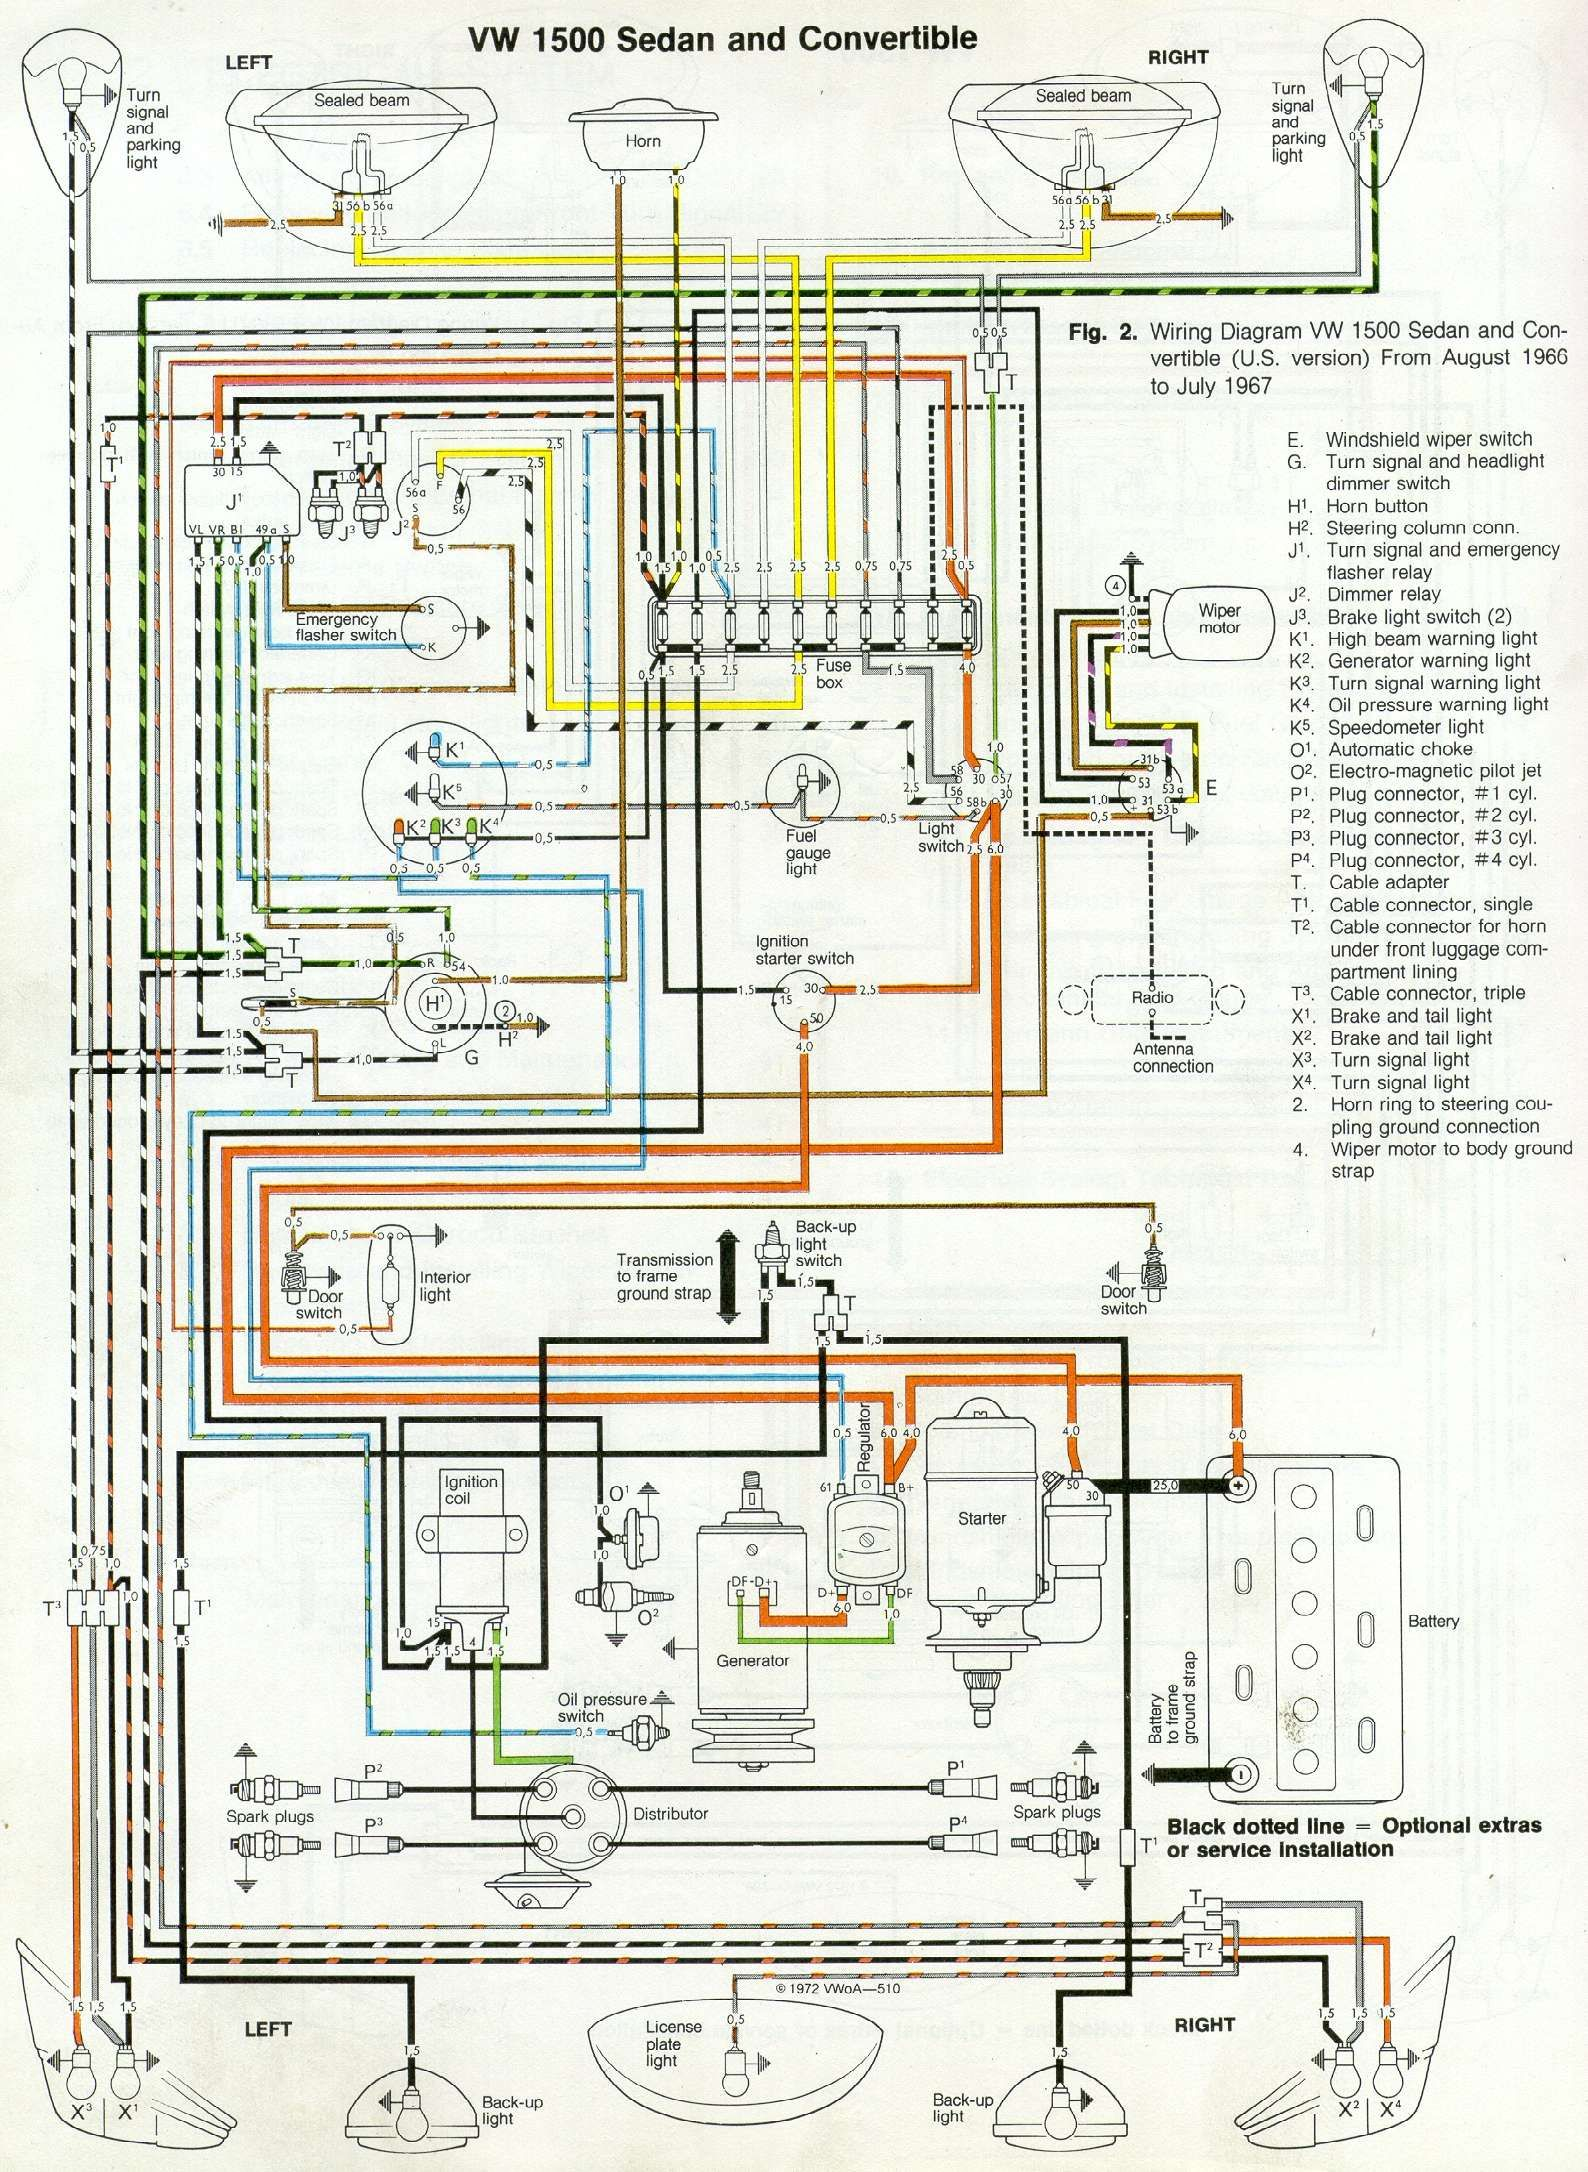 TD_1169] Vw Beetle Wiring Diagram As Well Vw Bus Wiring Diagram On 1969 BugAtrix Wigeg Mohammedshrine Librar Wiring 101